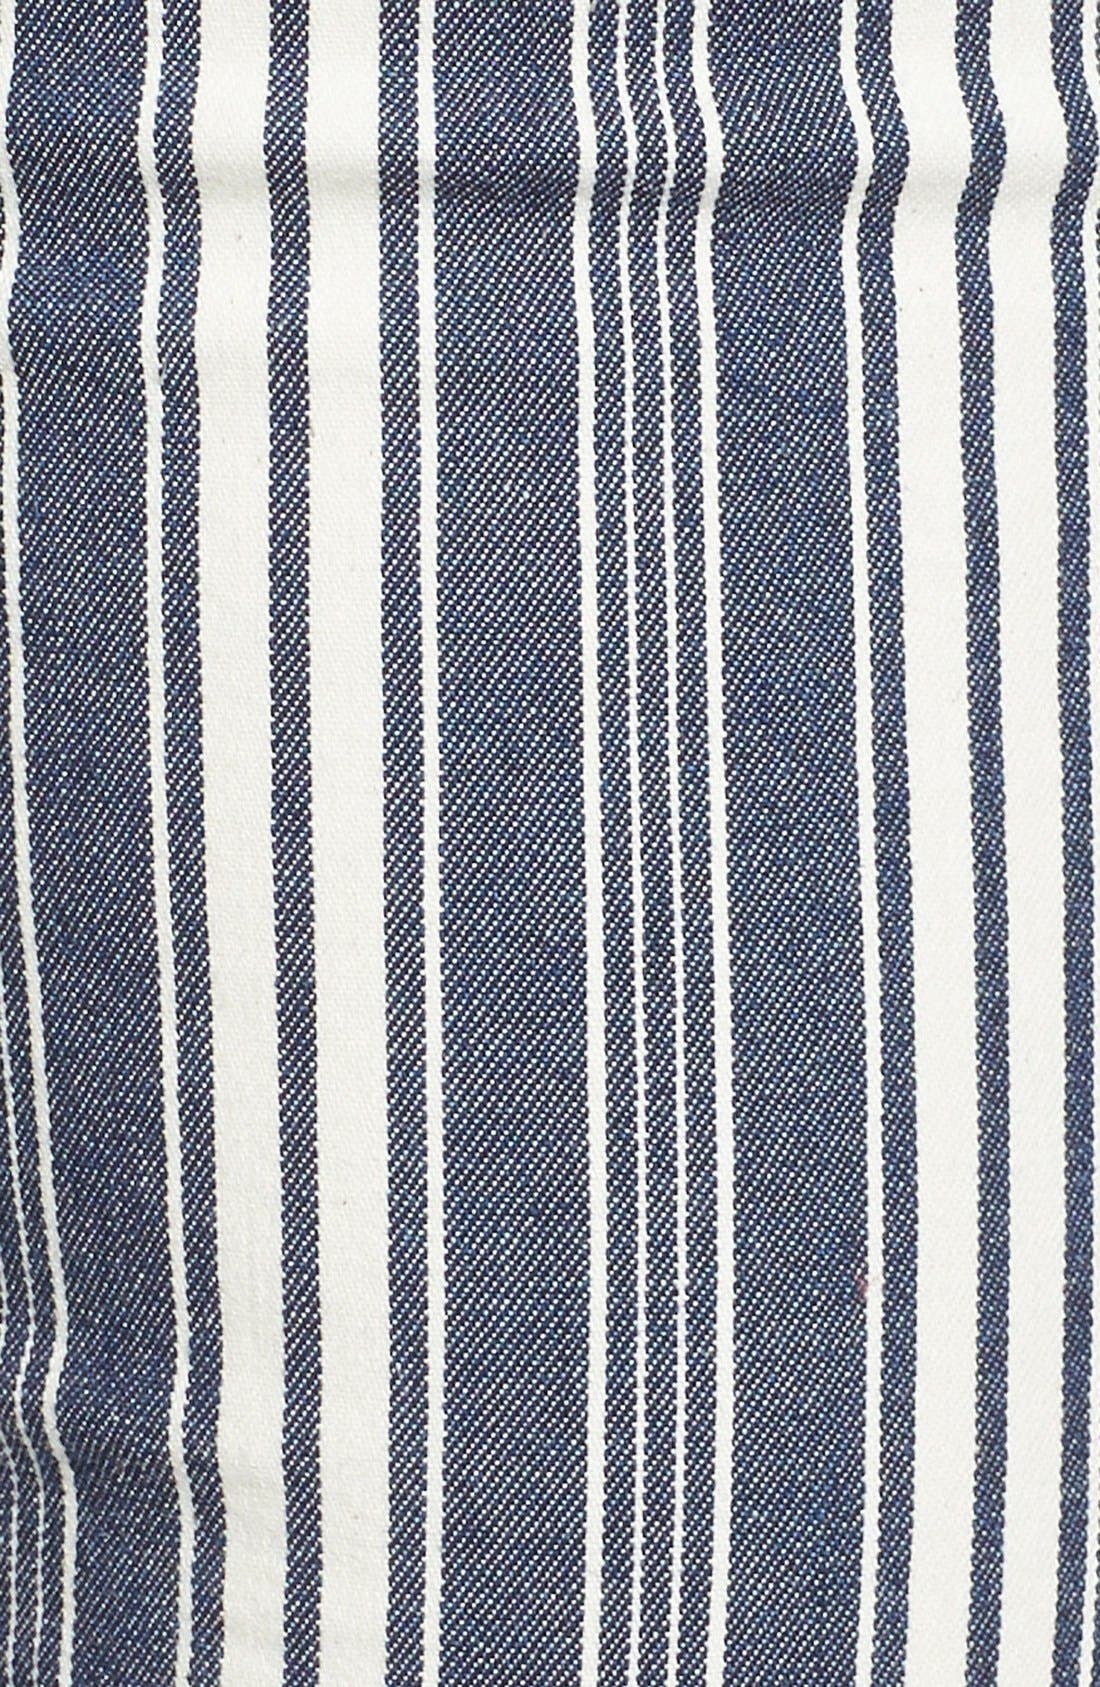 Alternate Image 5  - 7 For All Mankind® Ankle Straight Leg Jeans (Indigo Stripe)